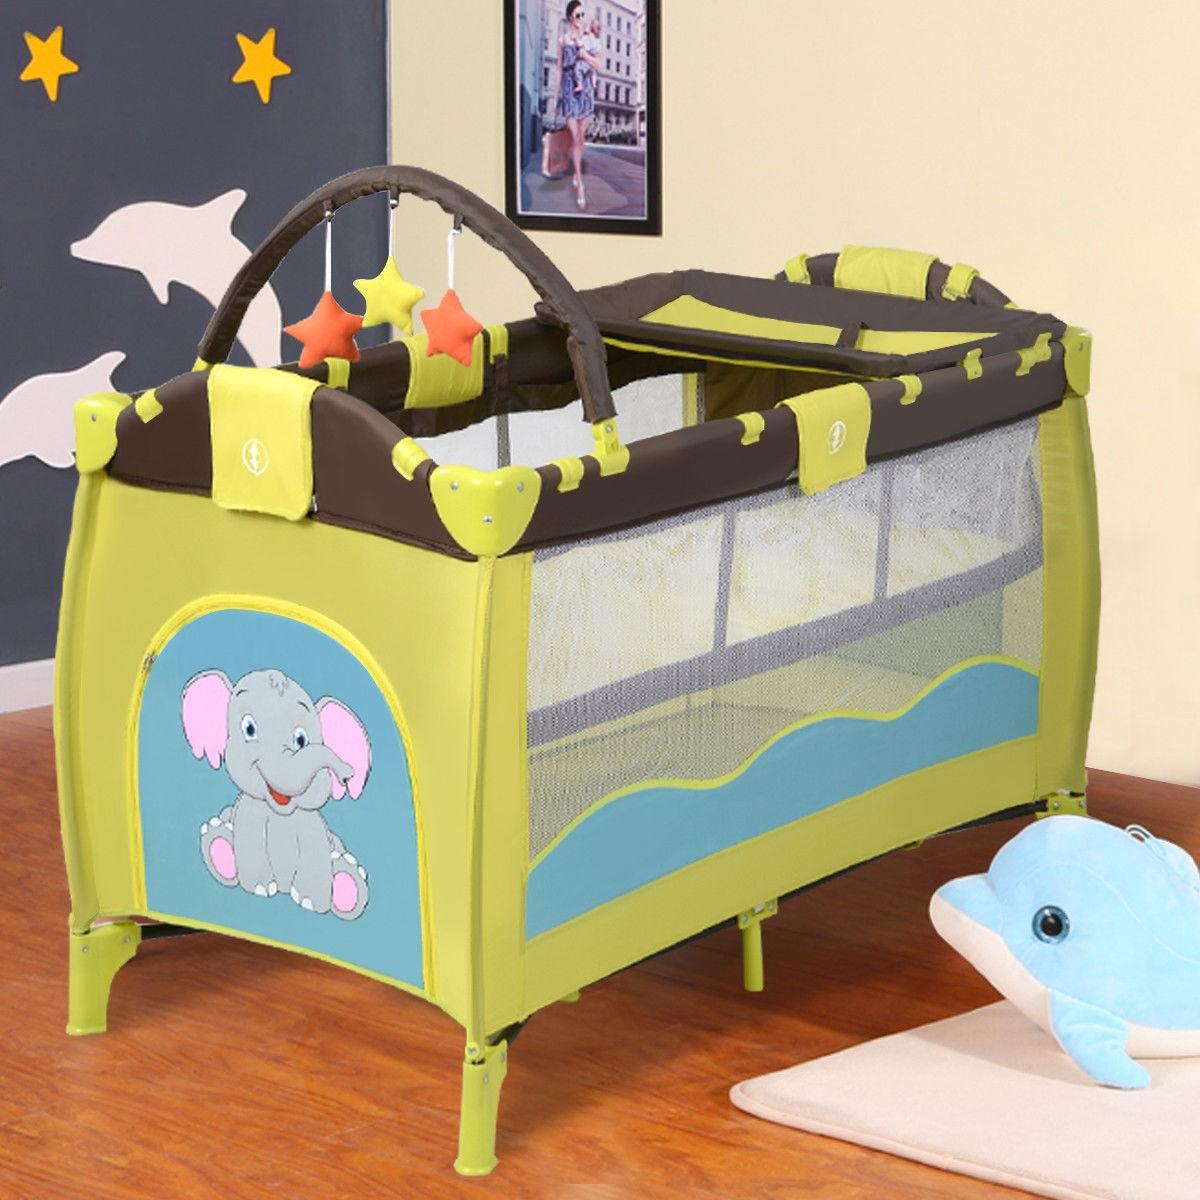 Portable Baby Crib Playpen Playard Pack Travel Infant Bassinet Bed Blue